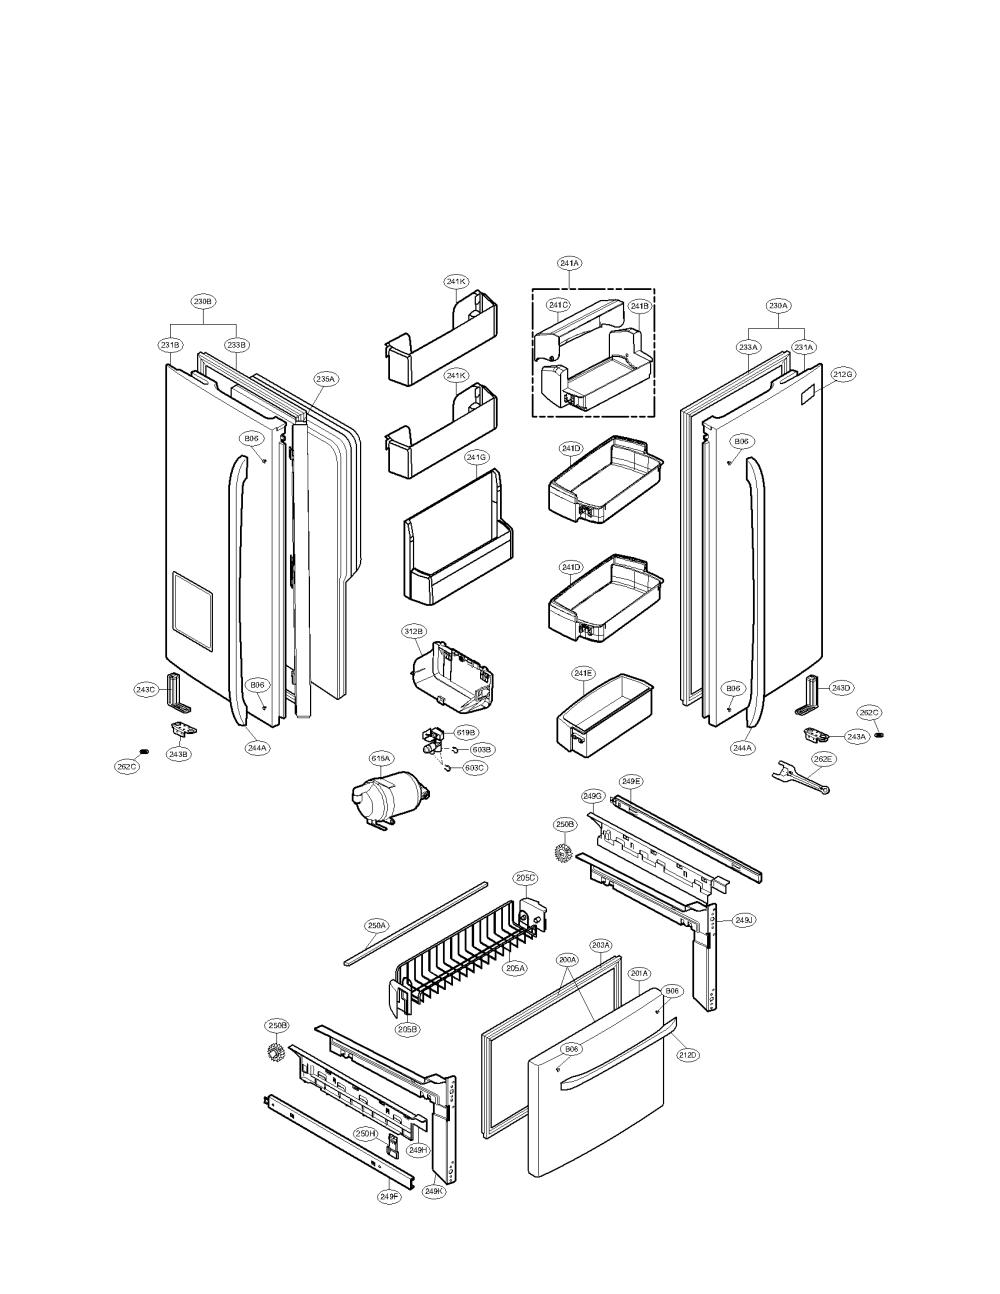 medium resolution of lg model lfx25976sw 00 bottom mount refrigerator genuine parts lfc22770st lg refrigerator diagrams lg refrigerator diagrams